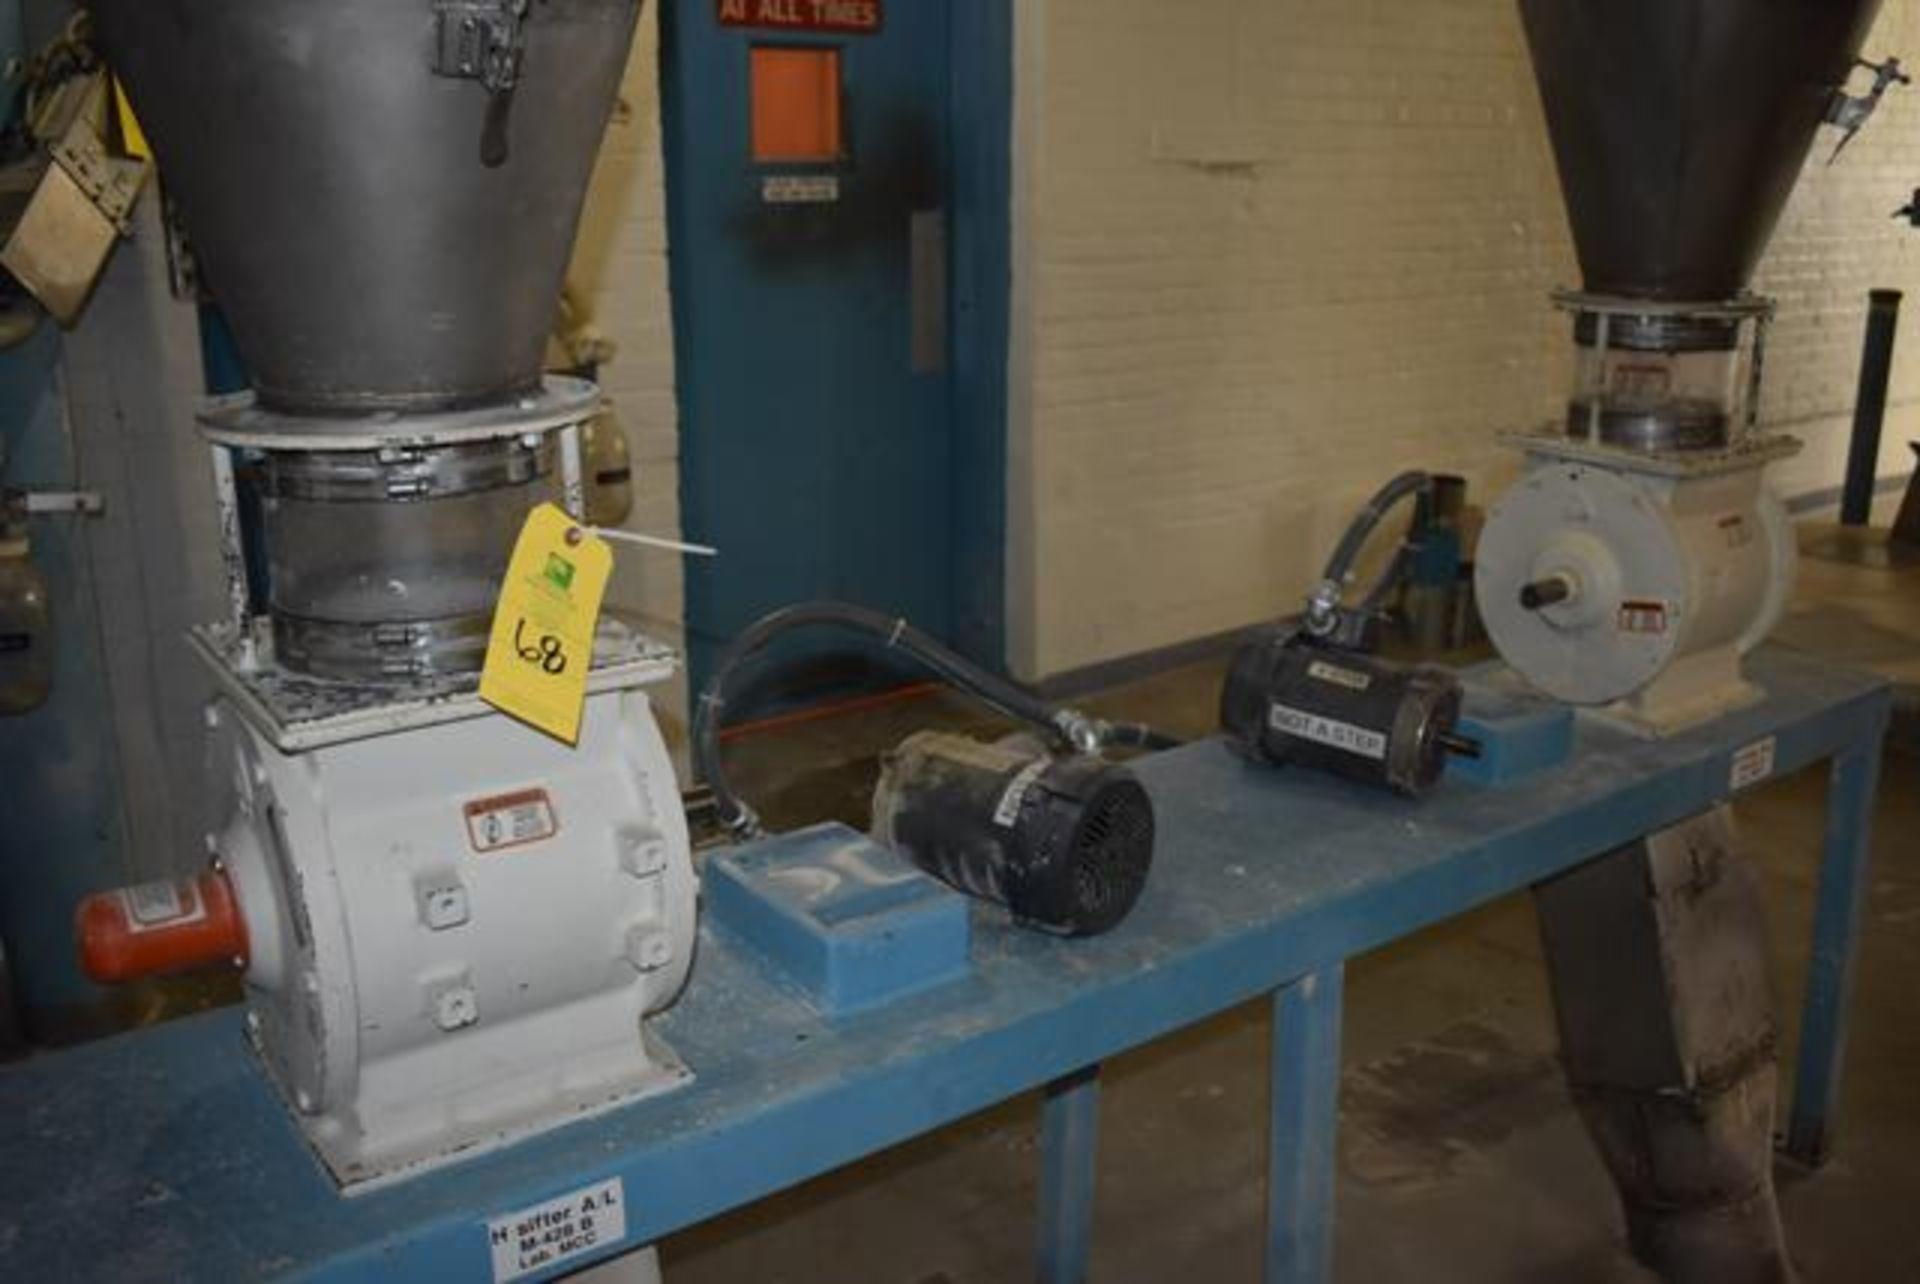 Lot 68 - Qty. (2) KICE Model #VJ10x8x8 Rotary Valves, Includes Cyclones